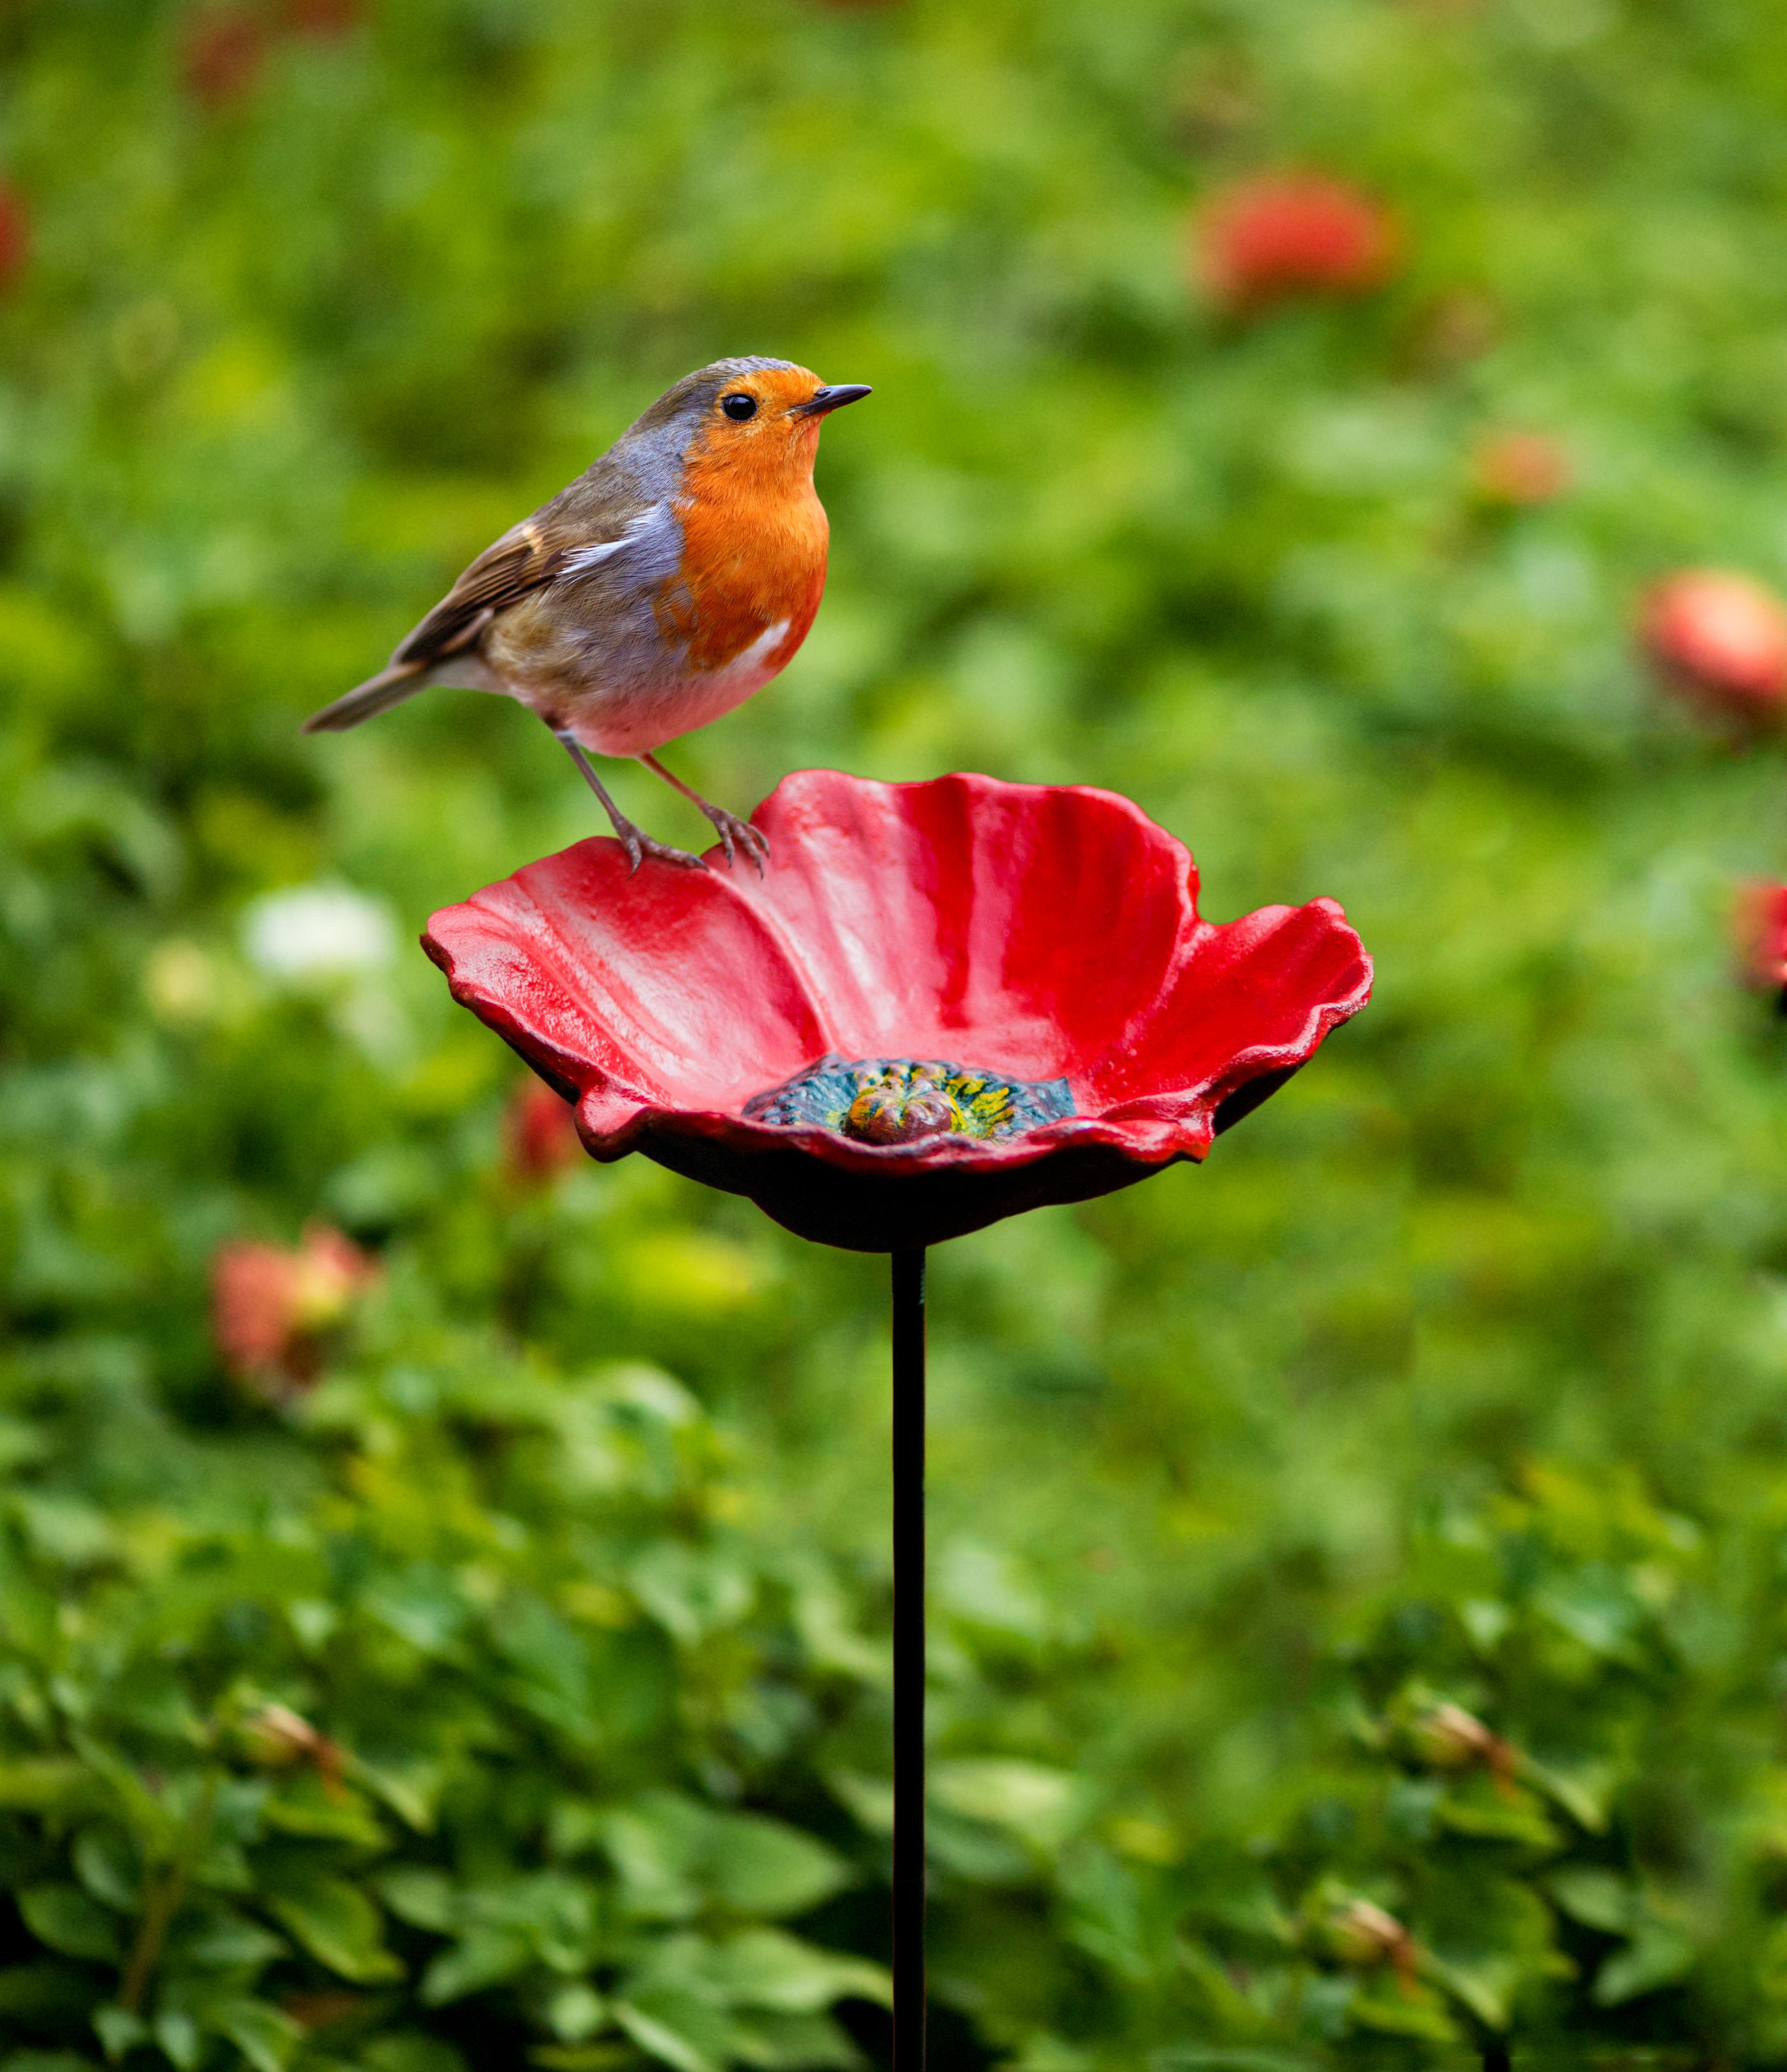 poppy-feeder-with-robin